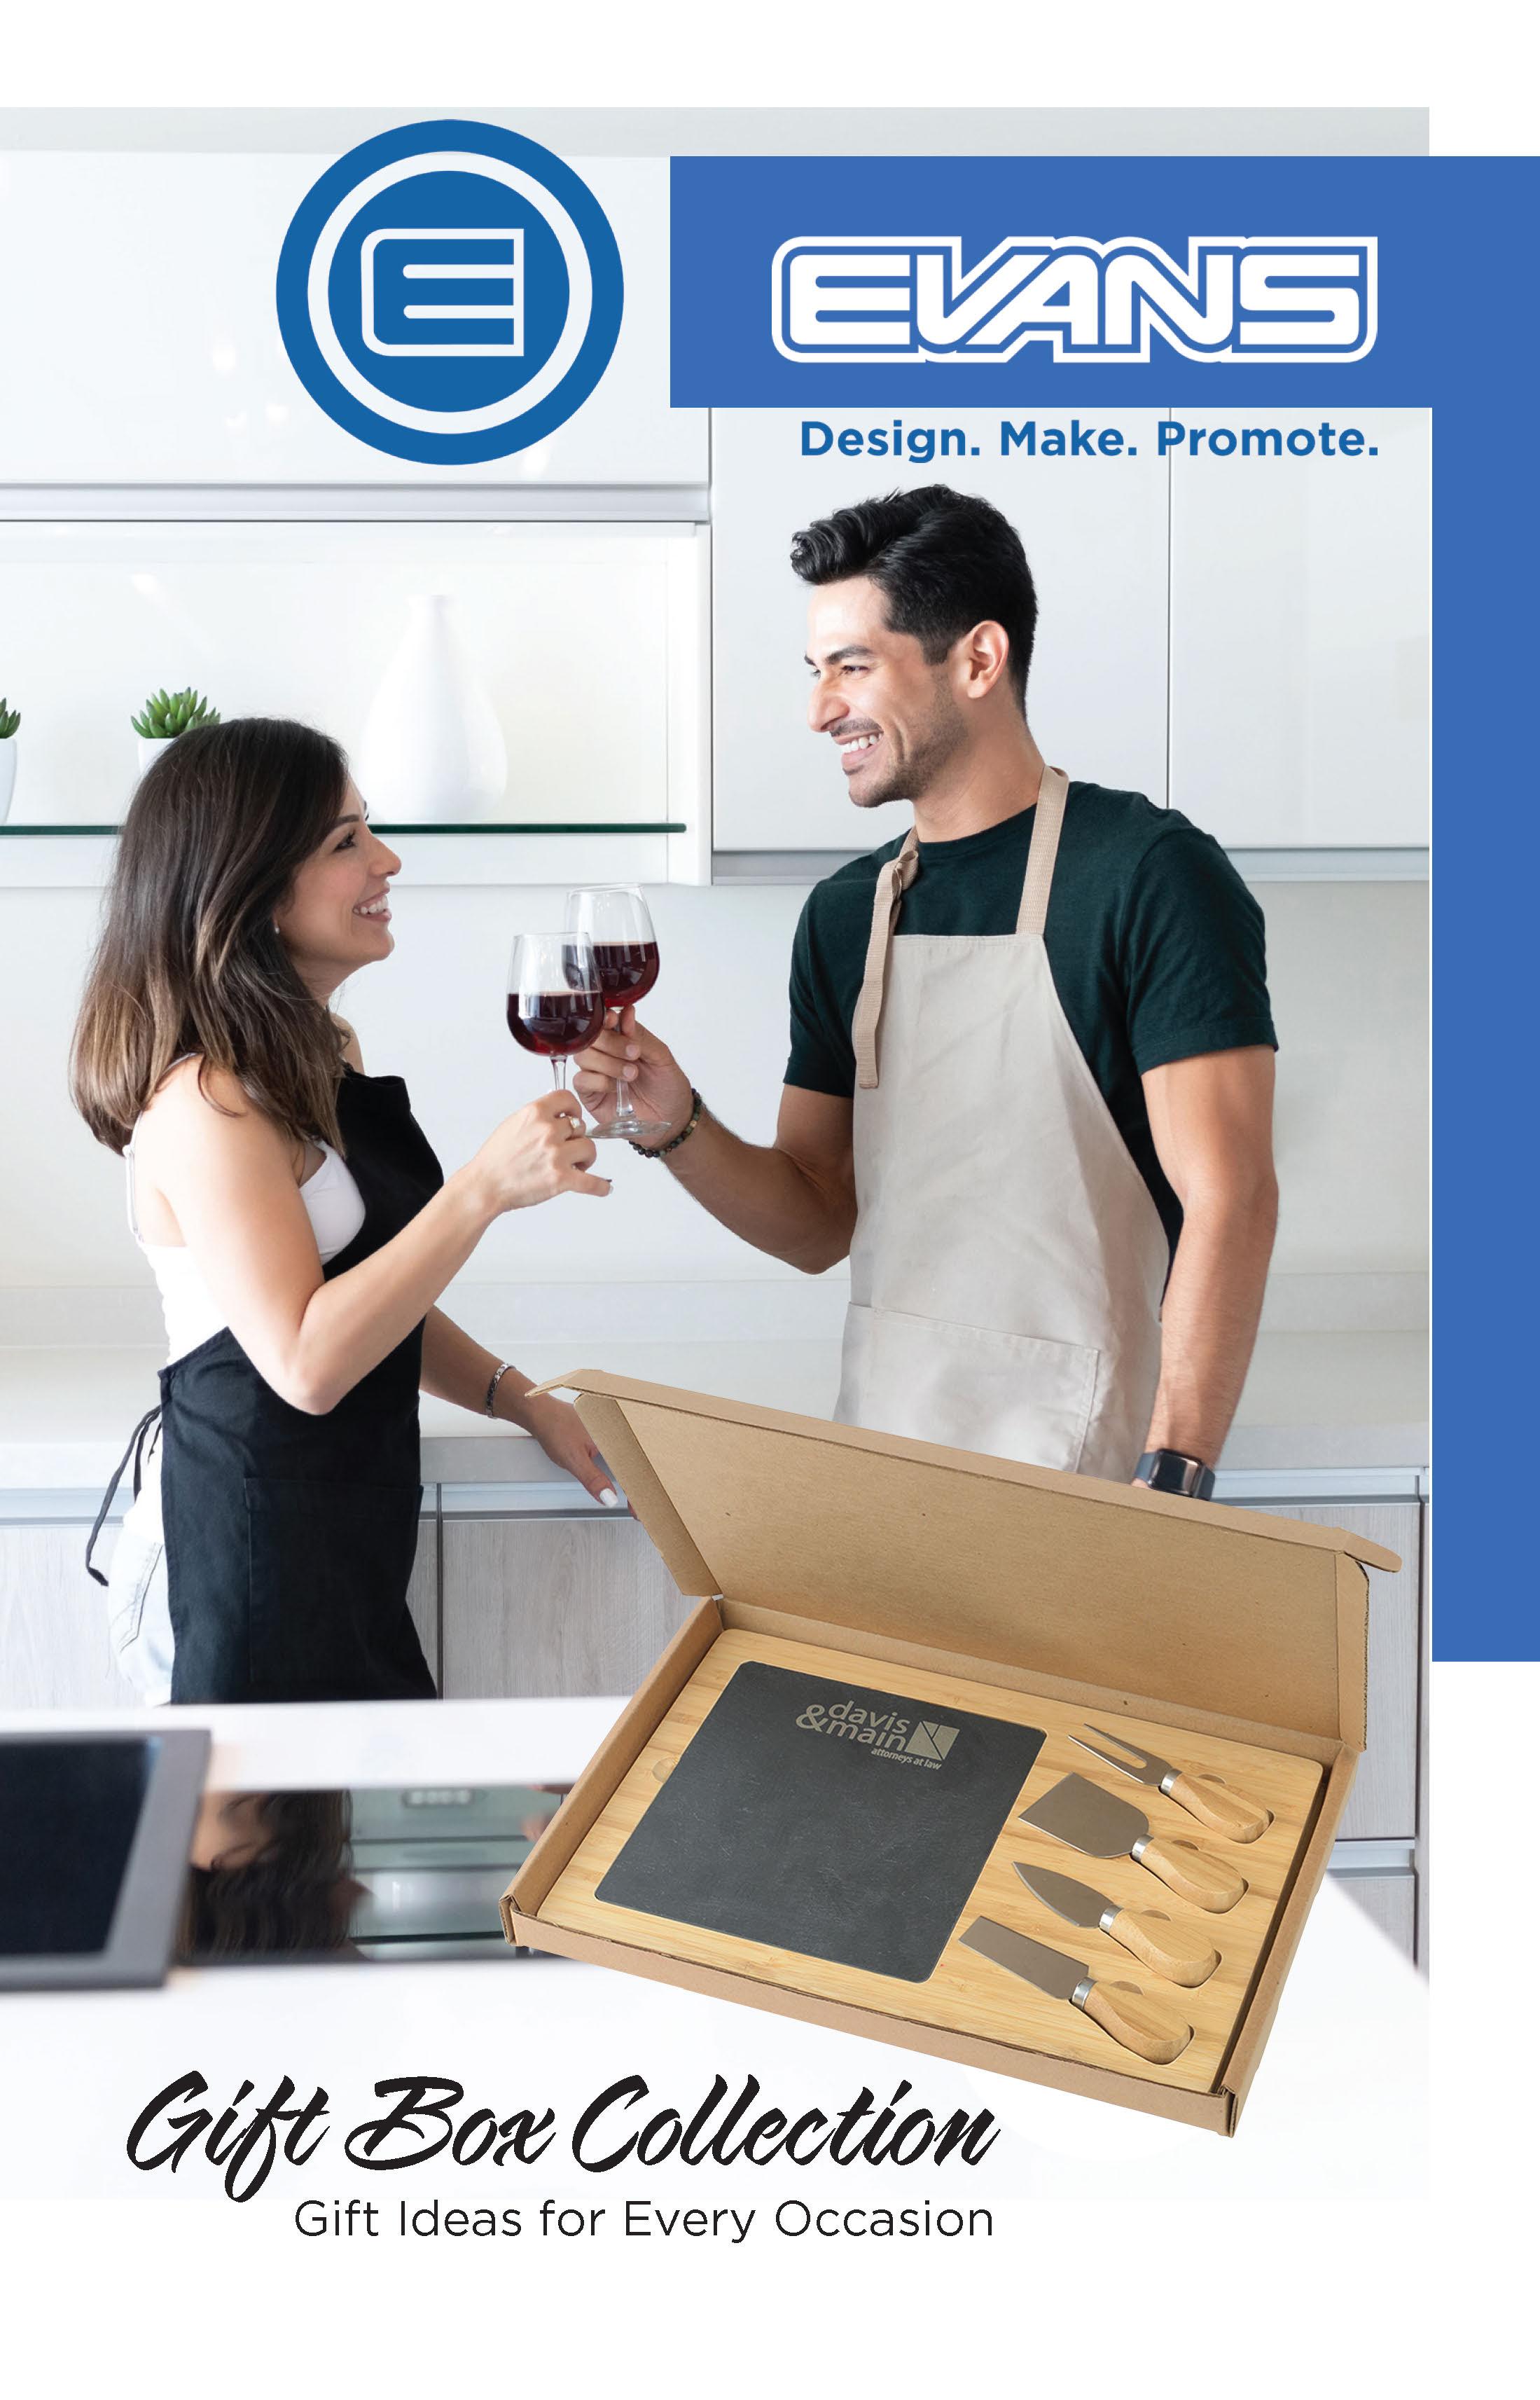 Create Custom - Gift Box Collection Brochure through ZoomCatalog